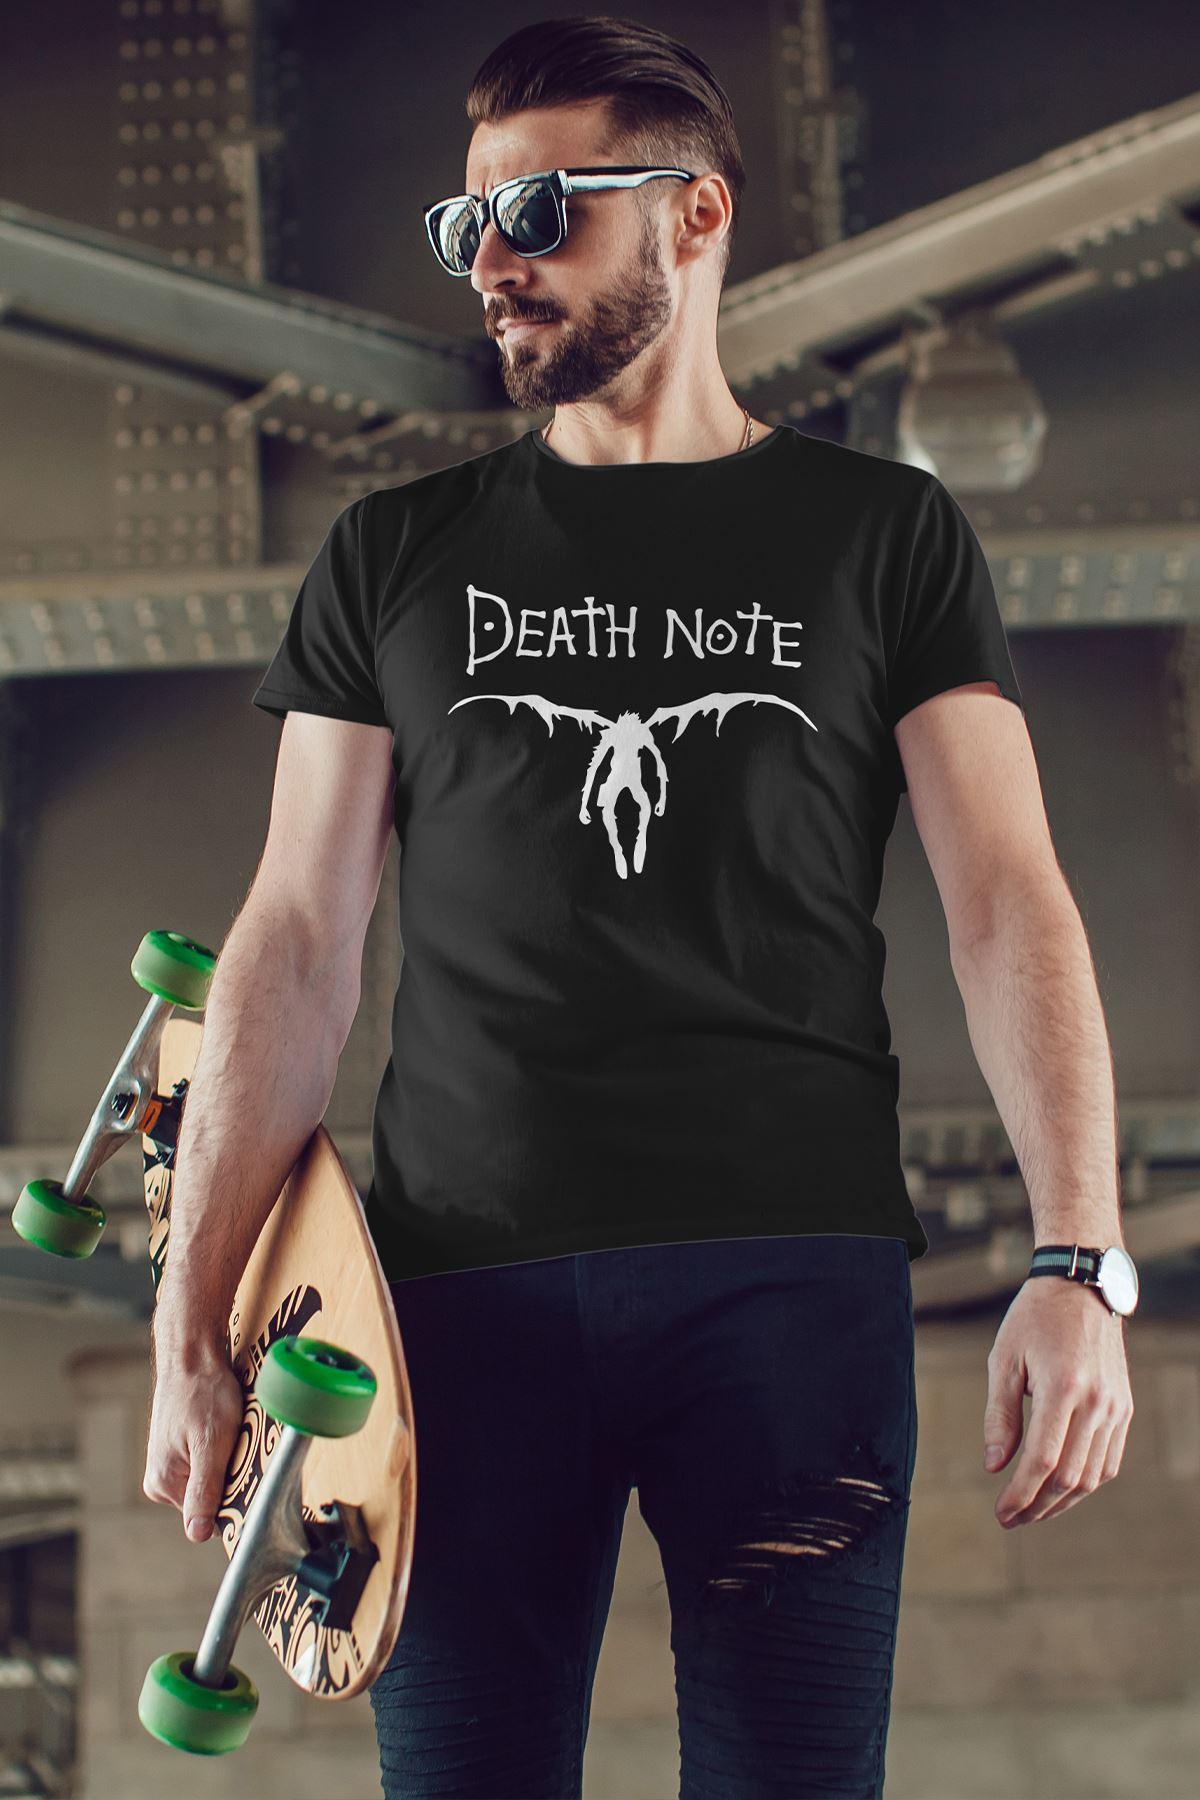 Anime Death Note 08 Siyah Erkek Tshirt - Tişört